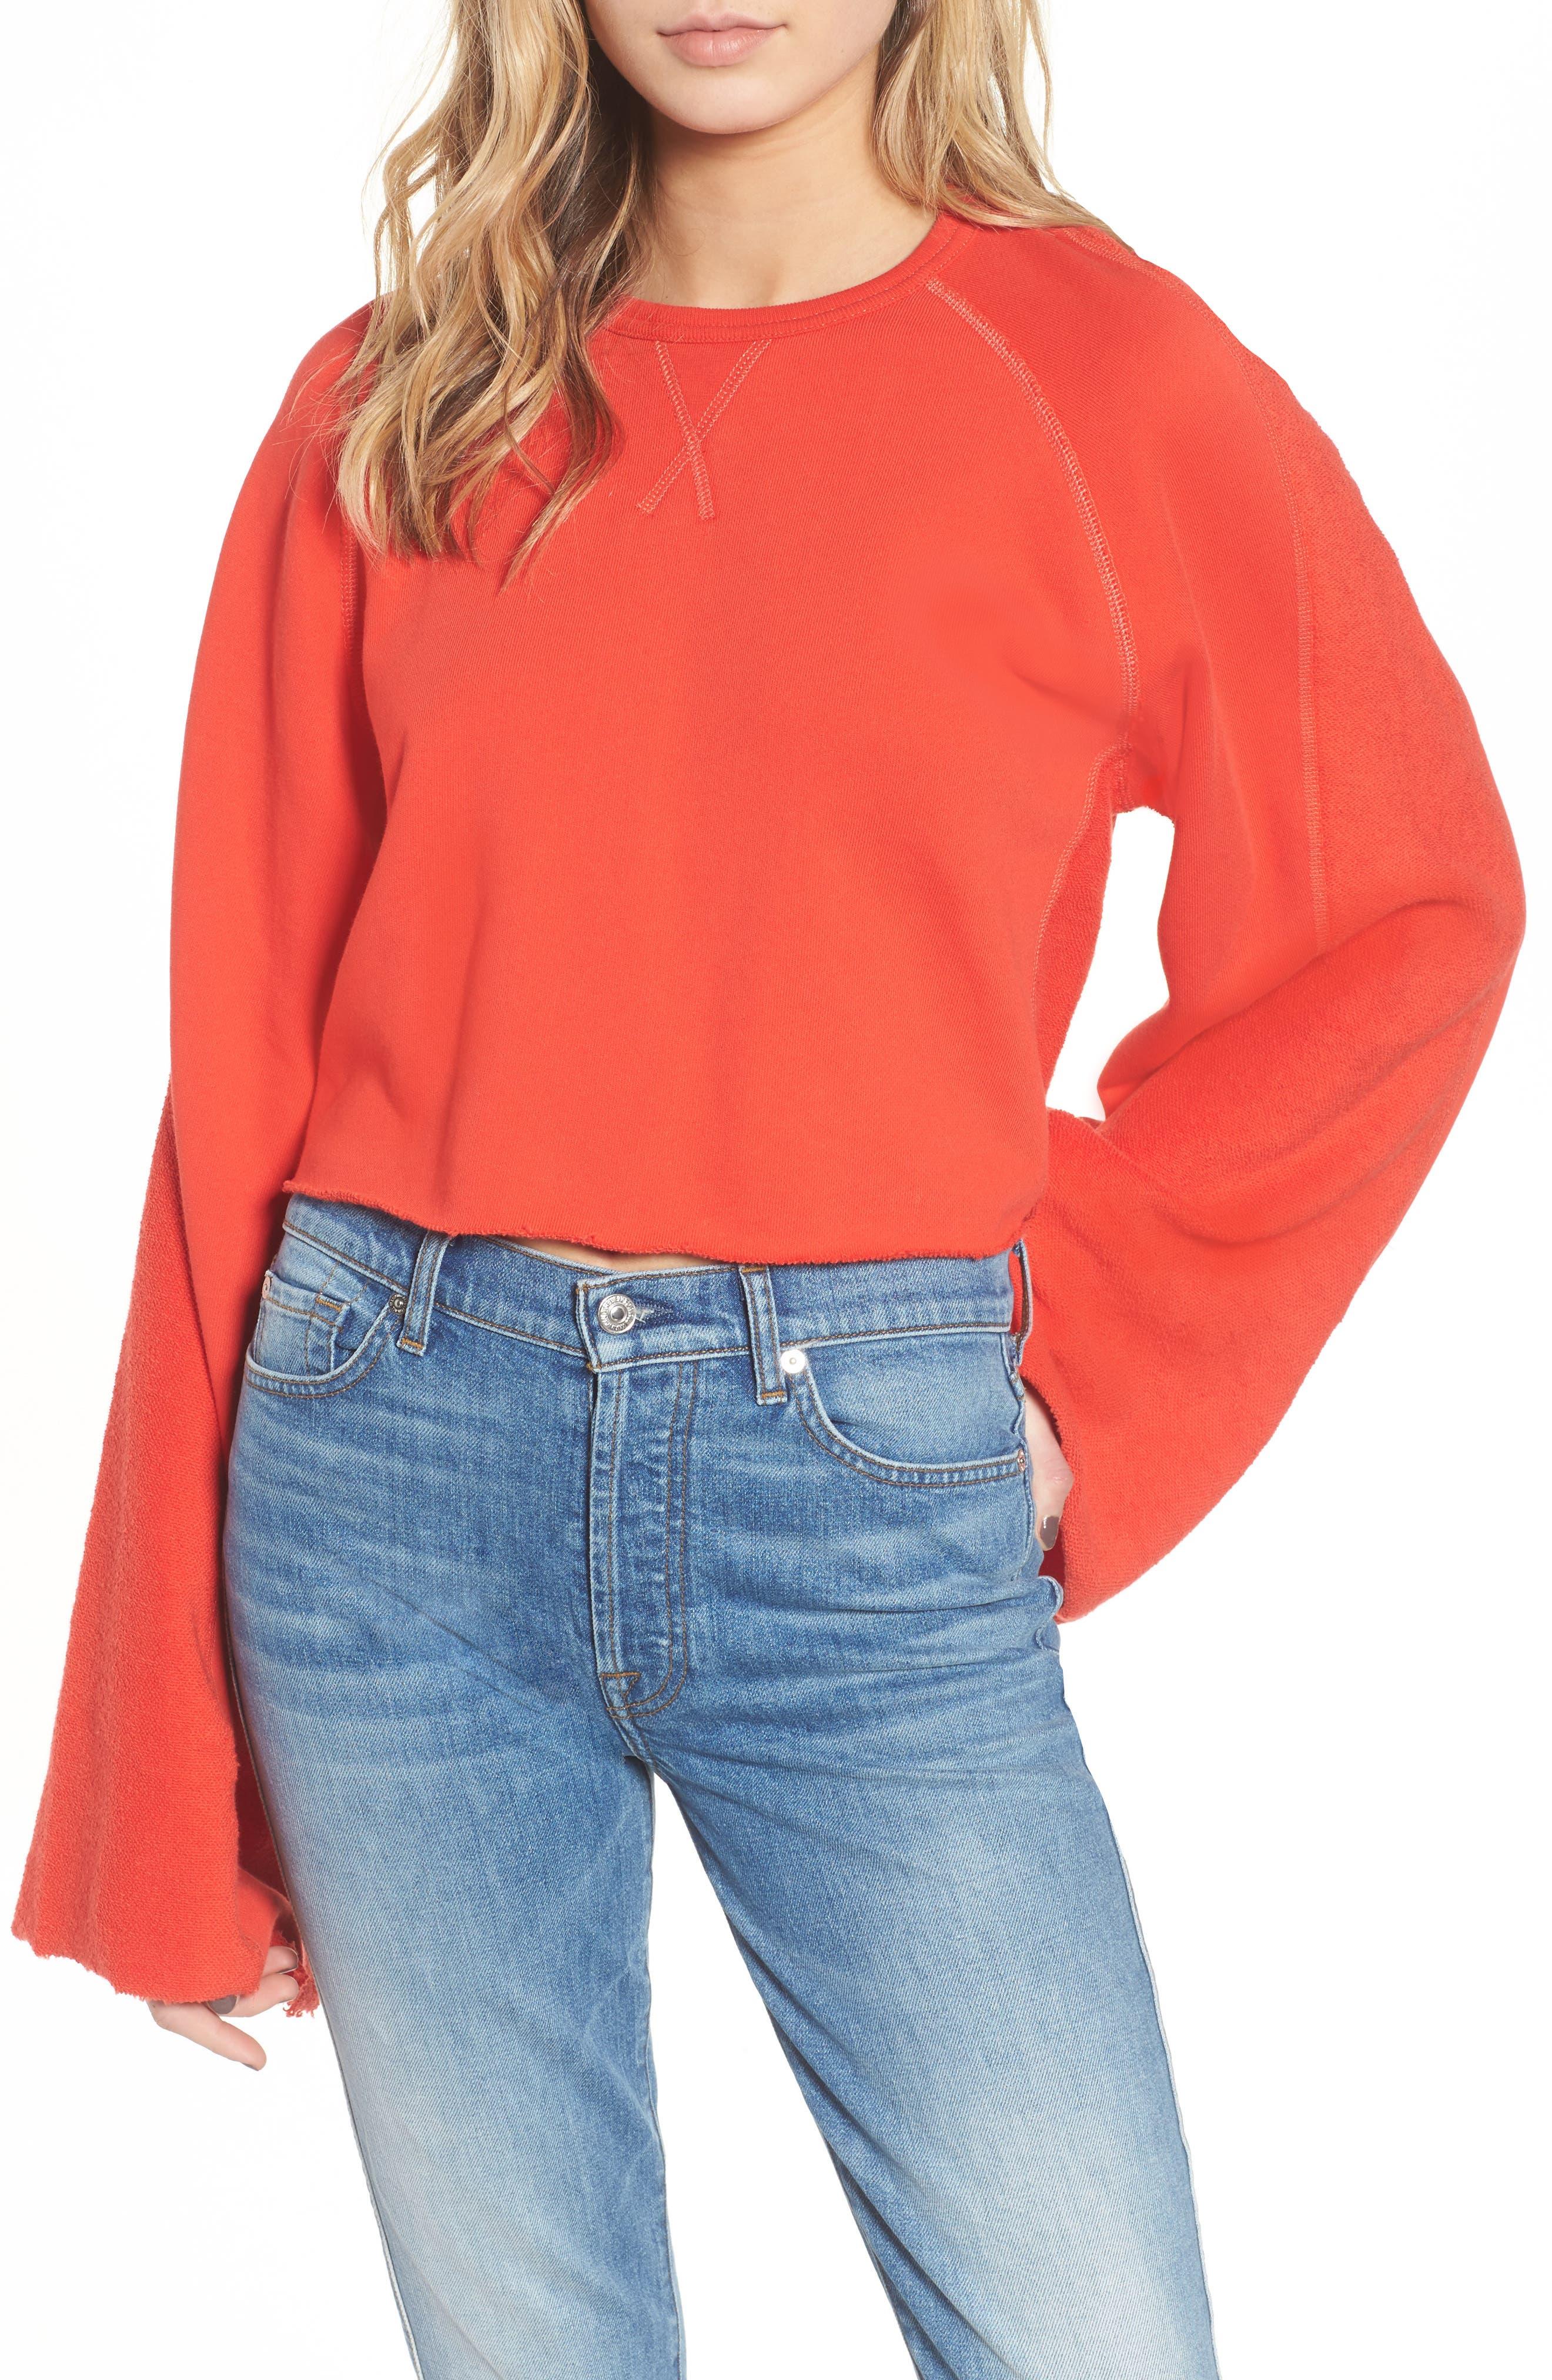 Alternate Image 1 Selected - 7 For All Mankind® Flare Sleeve Crop Sweatshirt